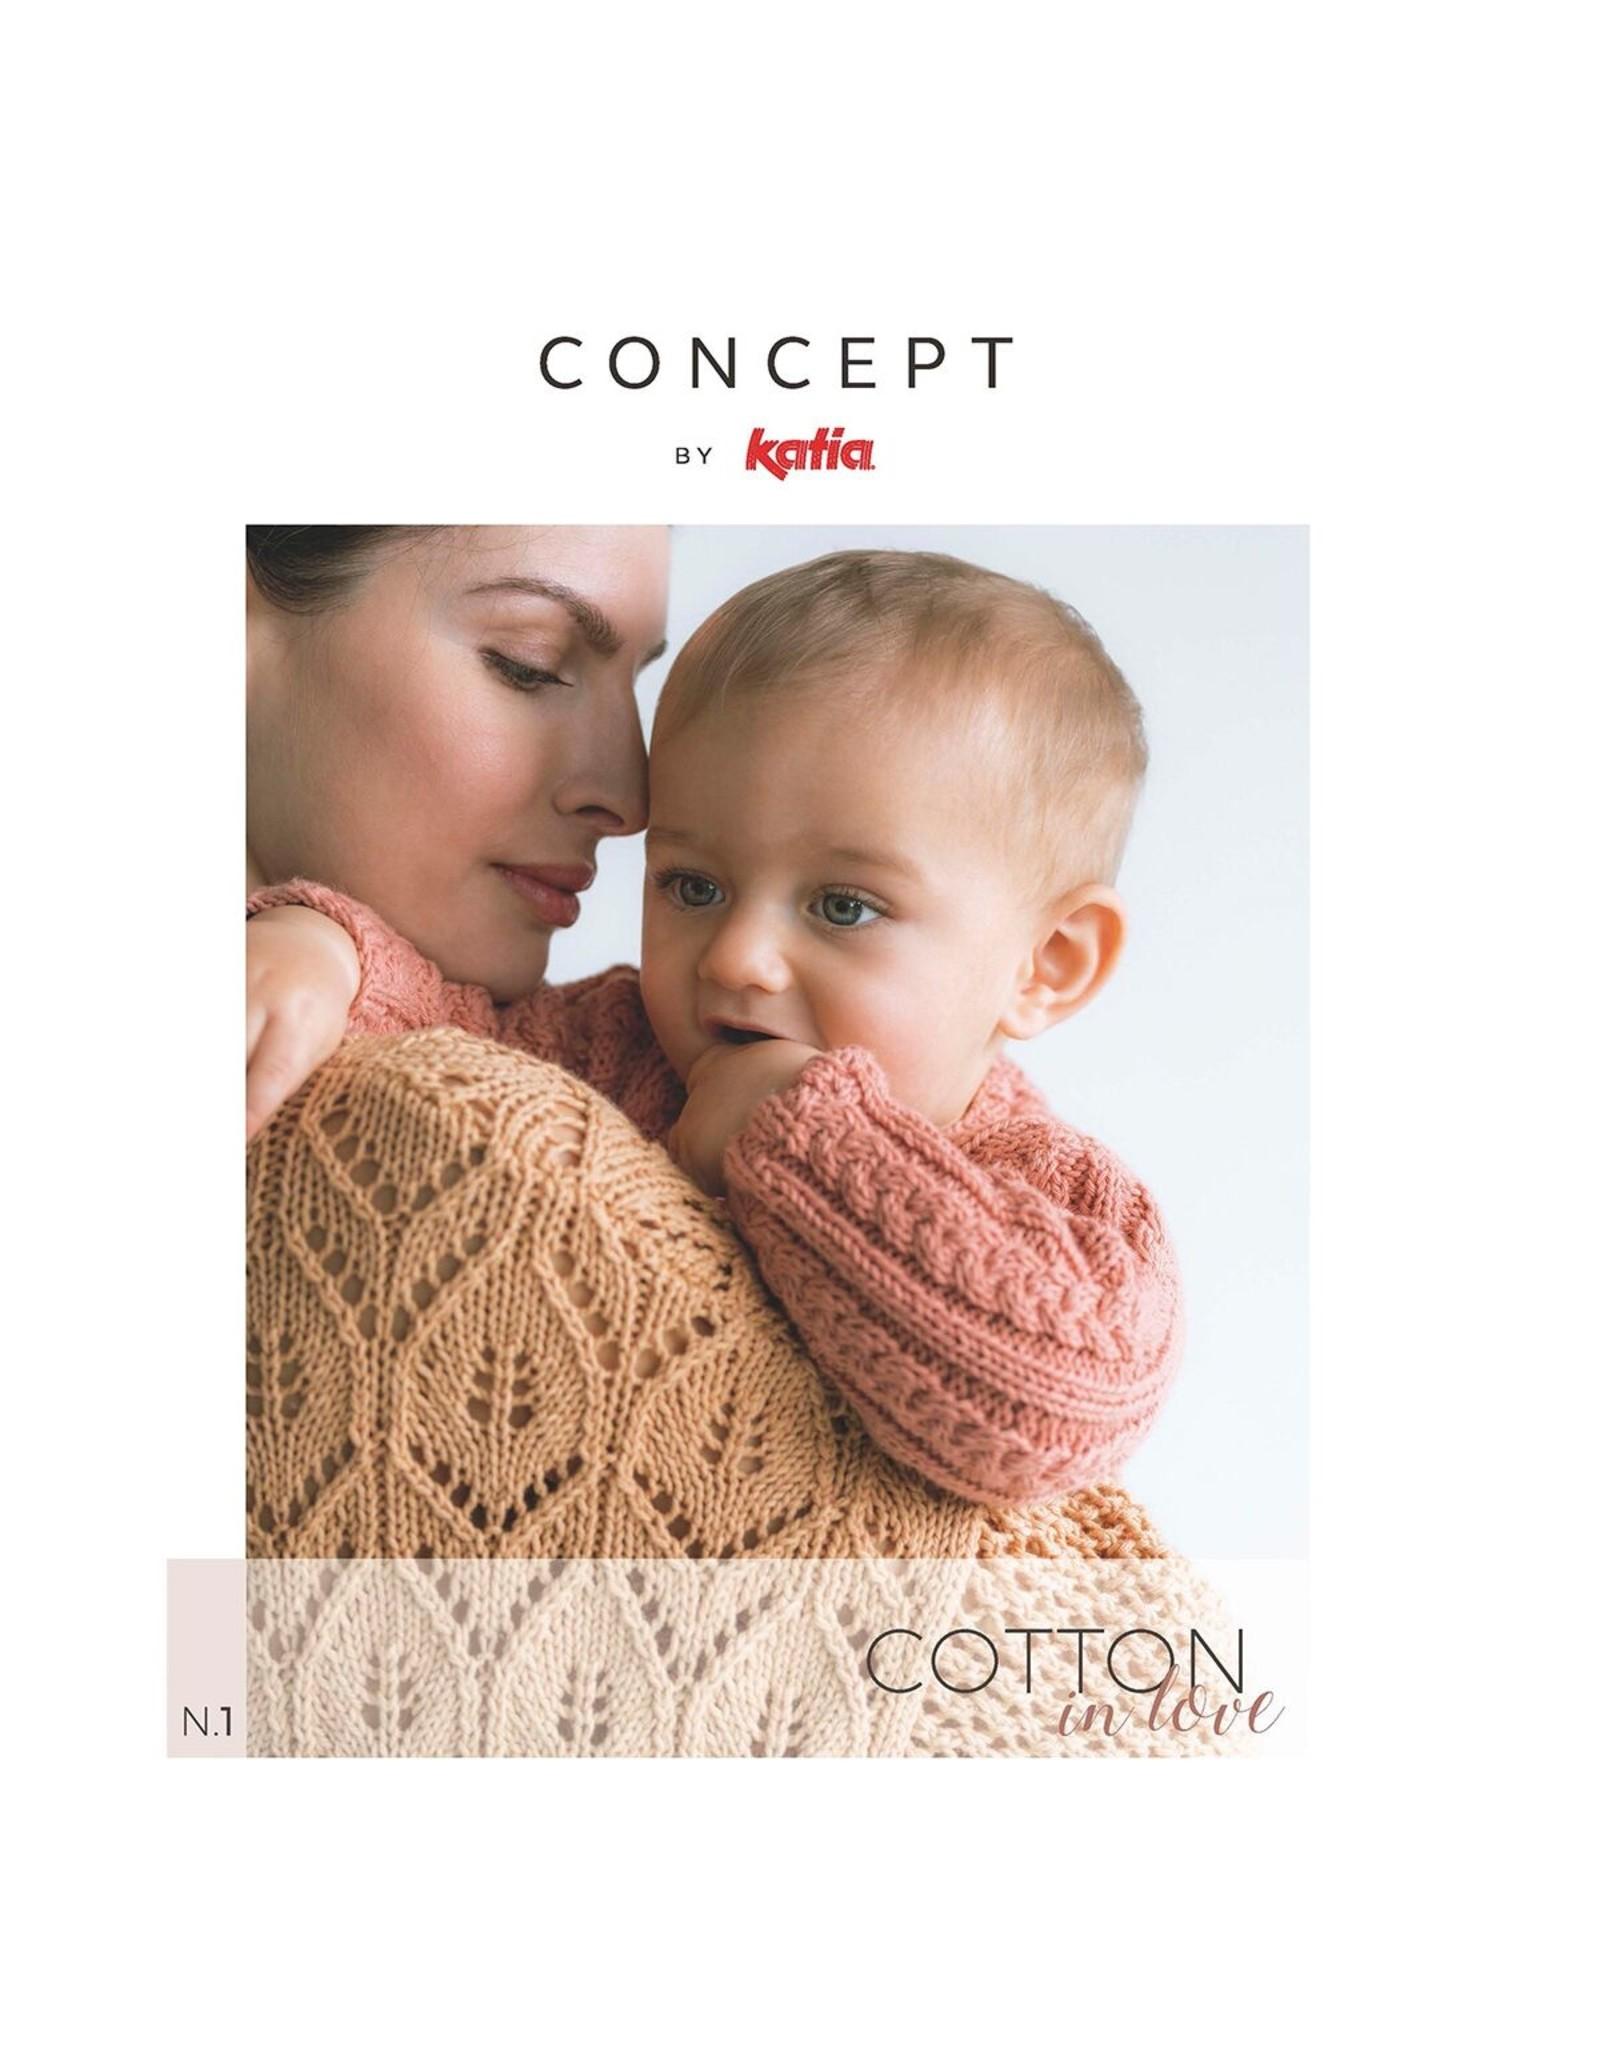 Katia Katia Concept Speciaal Cotton in Love 1